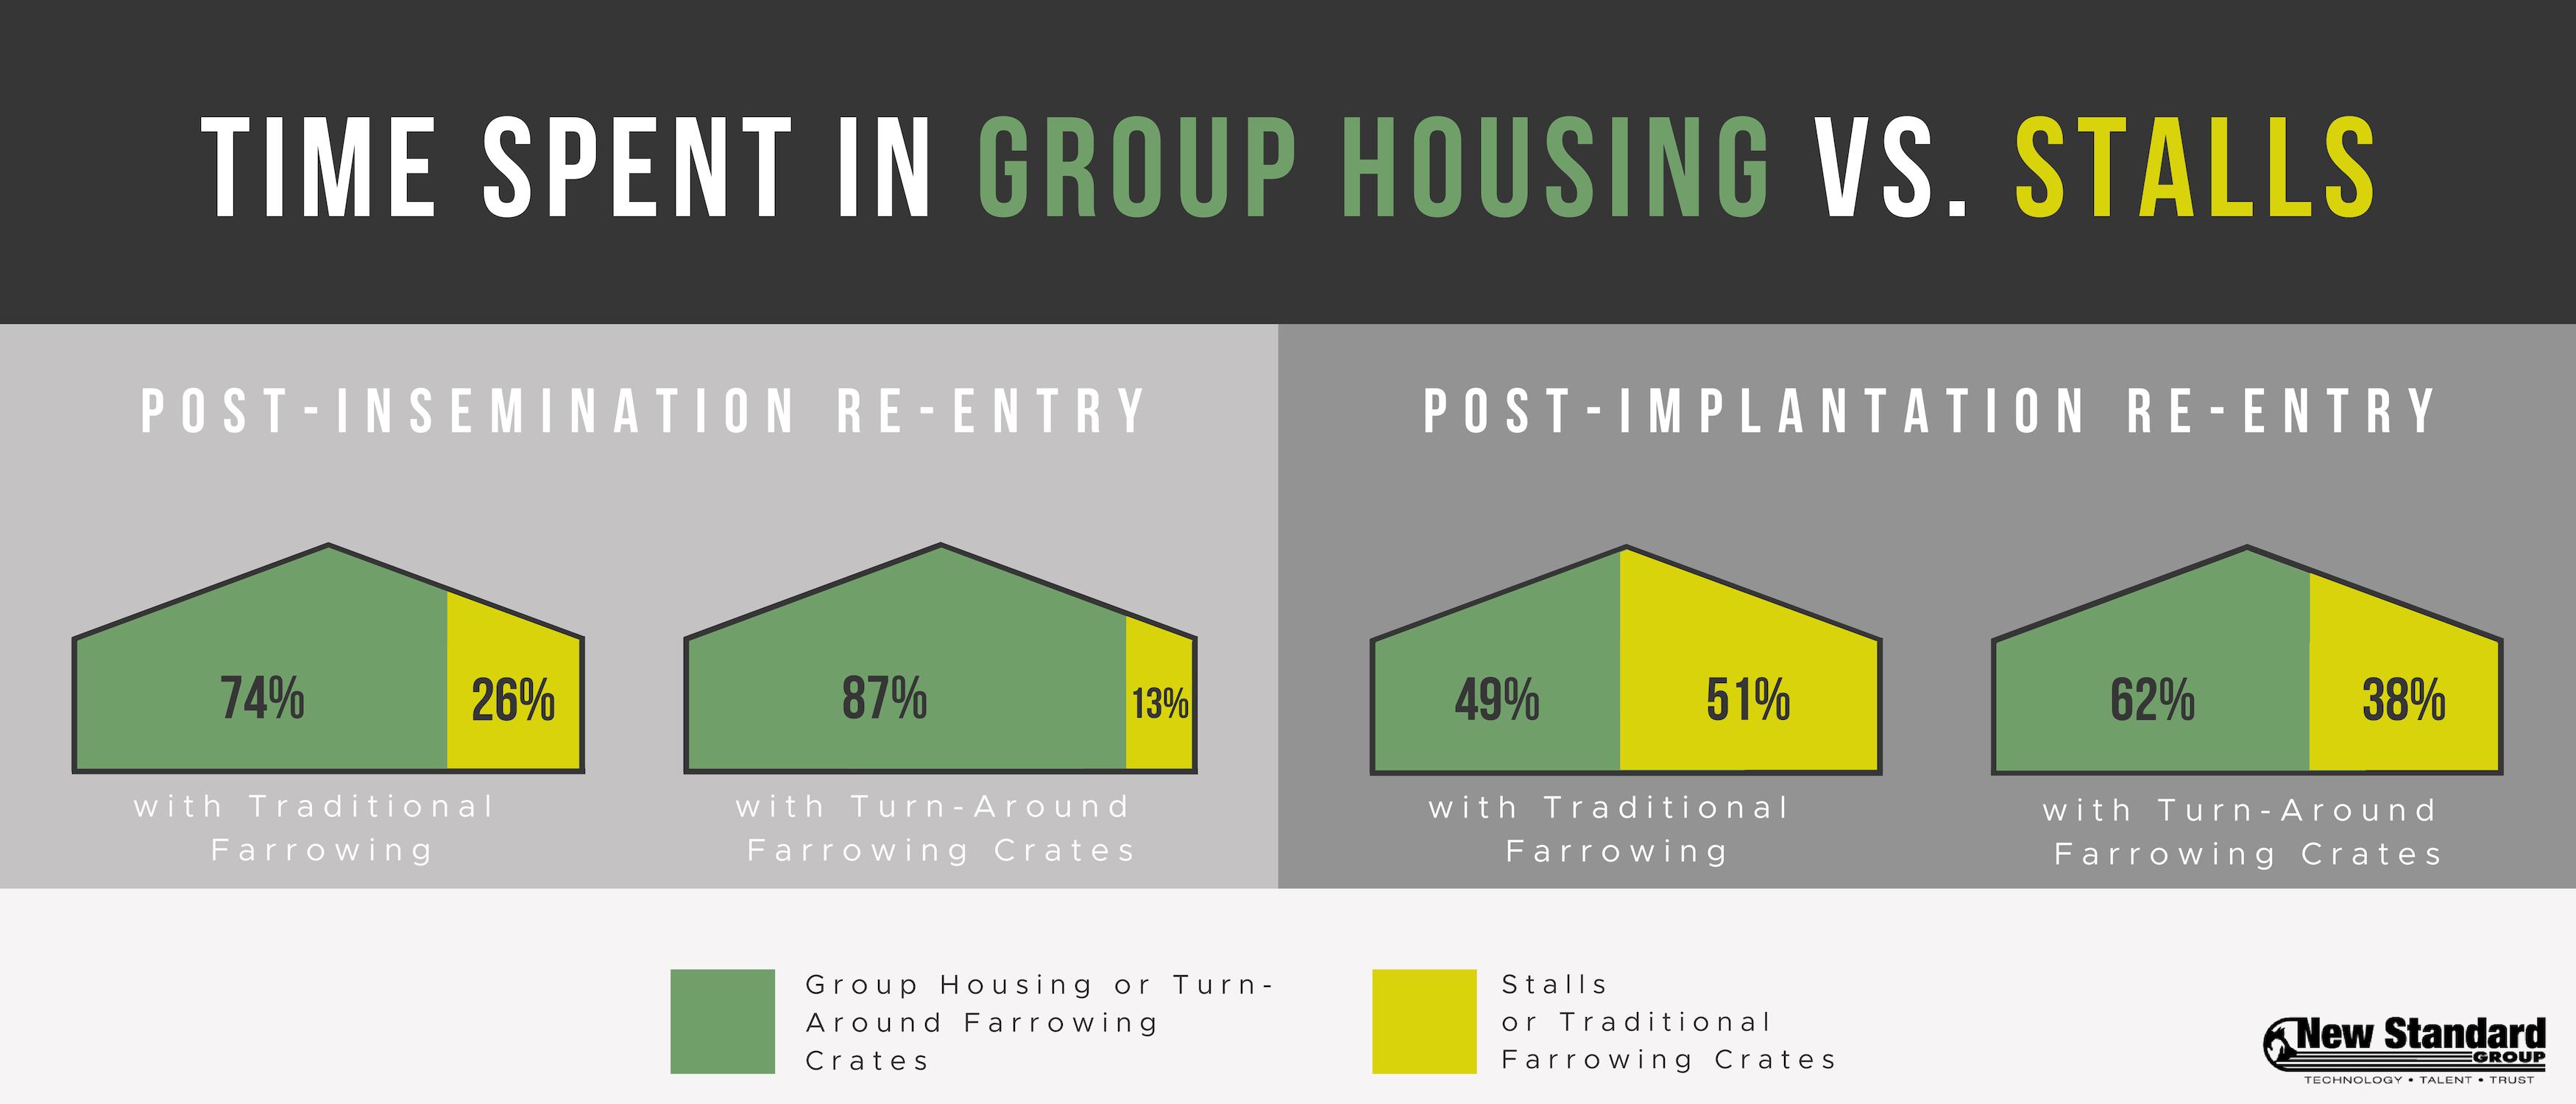 Wide Comparison - Single Graphic Post Insemination with Open Farrowing1